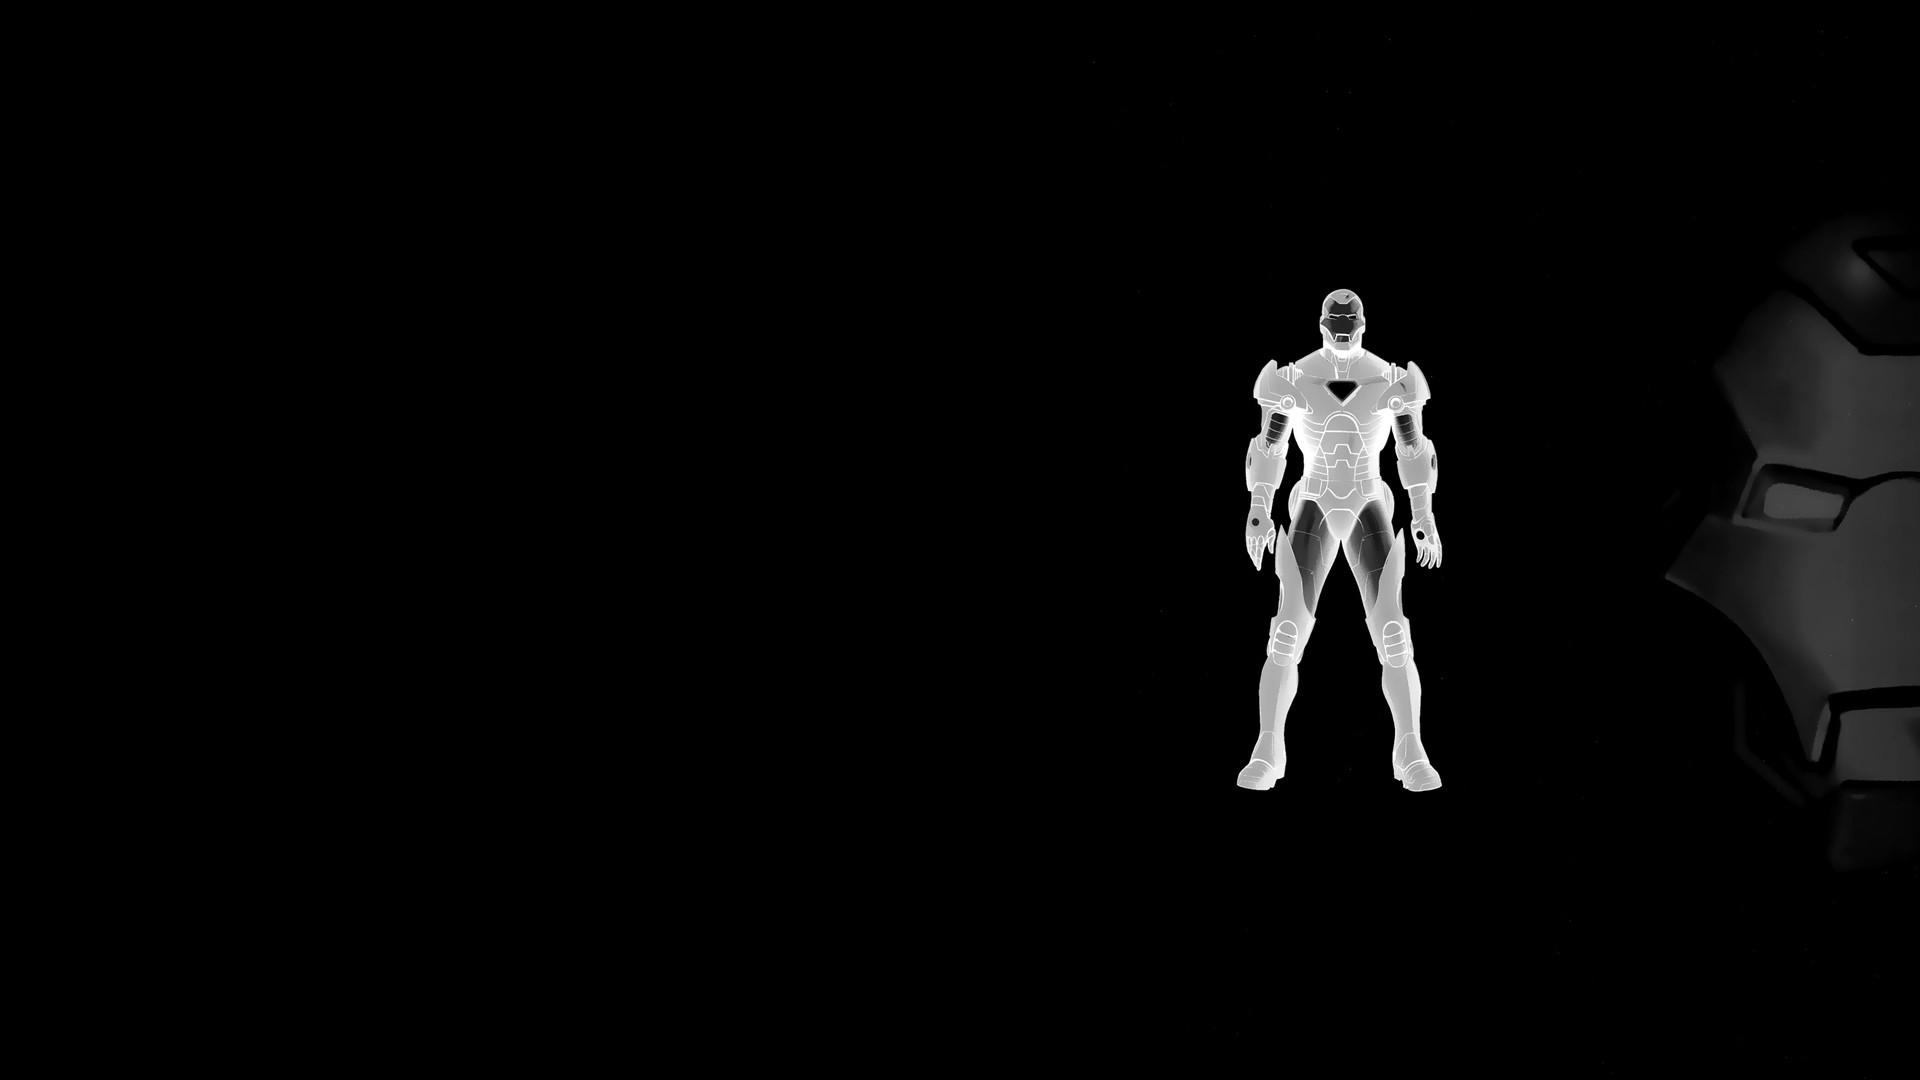 Iron Man Wallpaper HD 8963